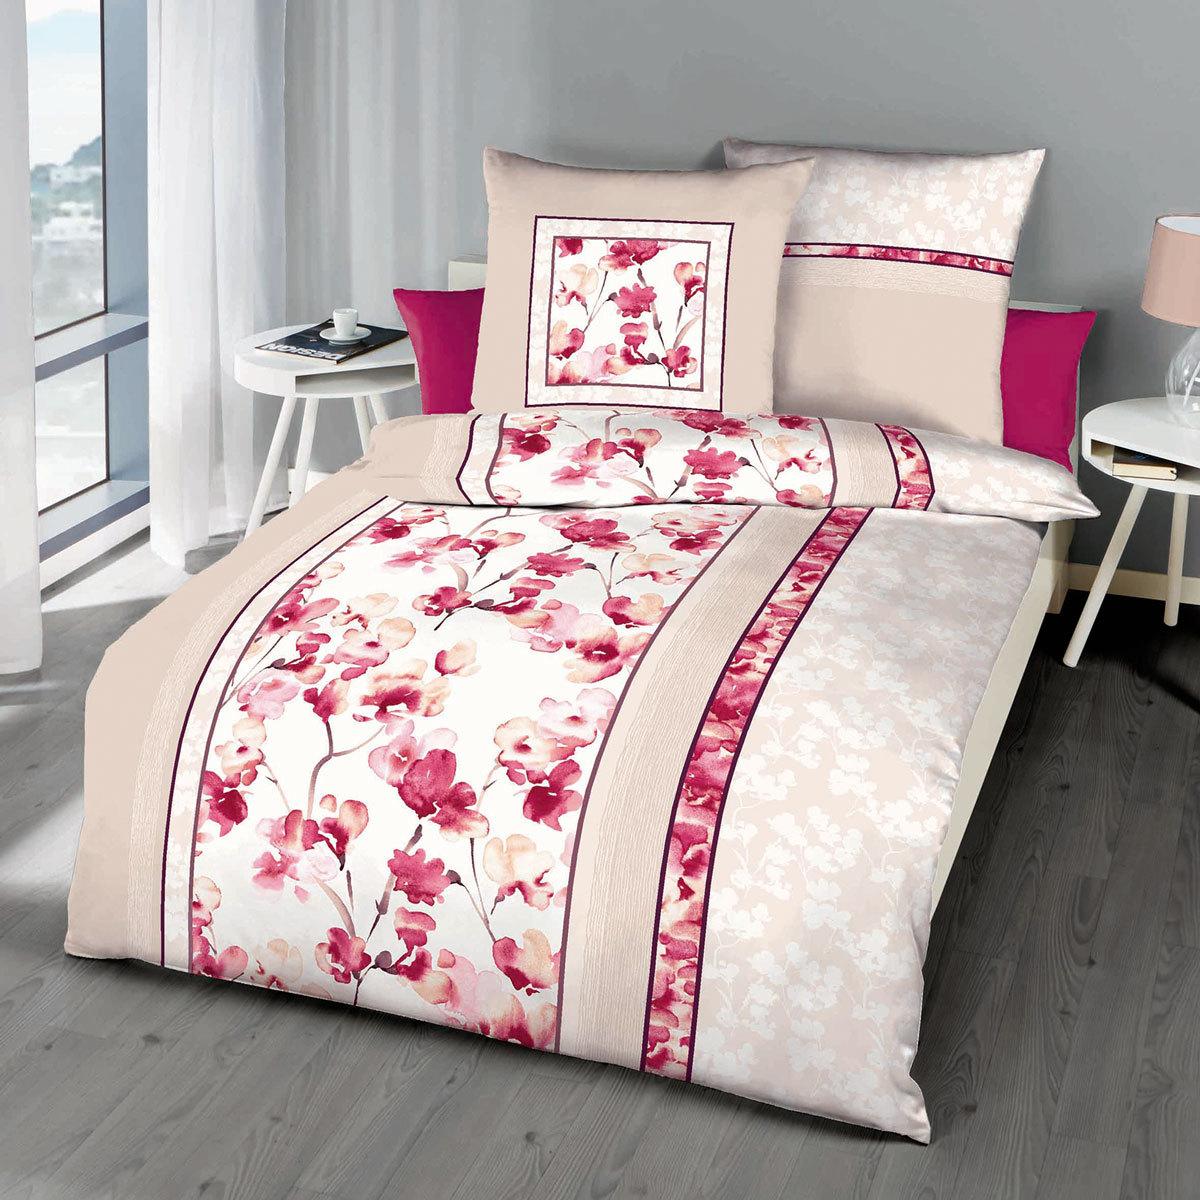 kaeppel mako satin bettw sche heyday pink erfolgsteams frankfurt. Black Bedroom Furniture Sets. Home Design Ideas